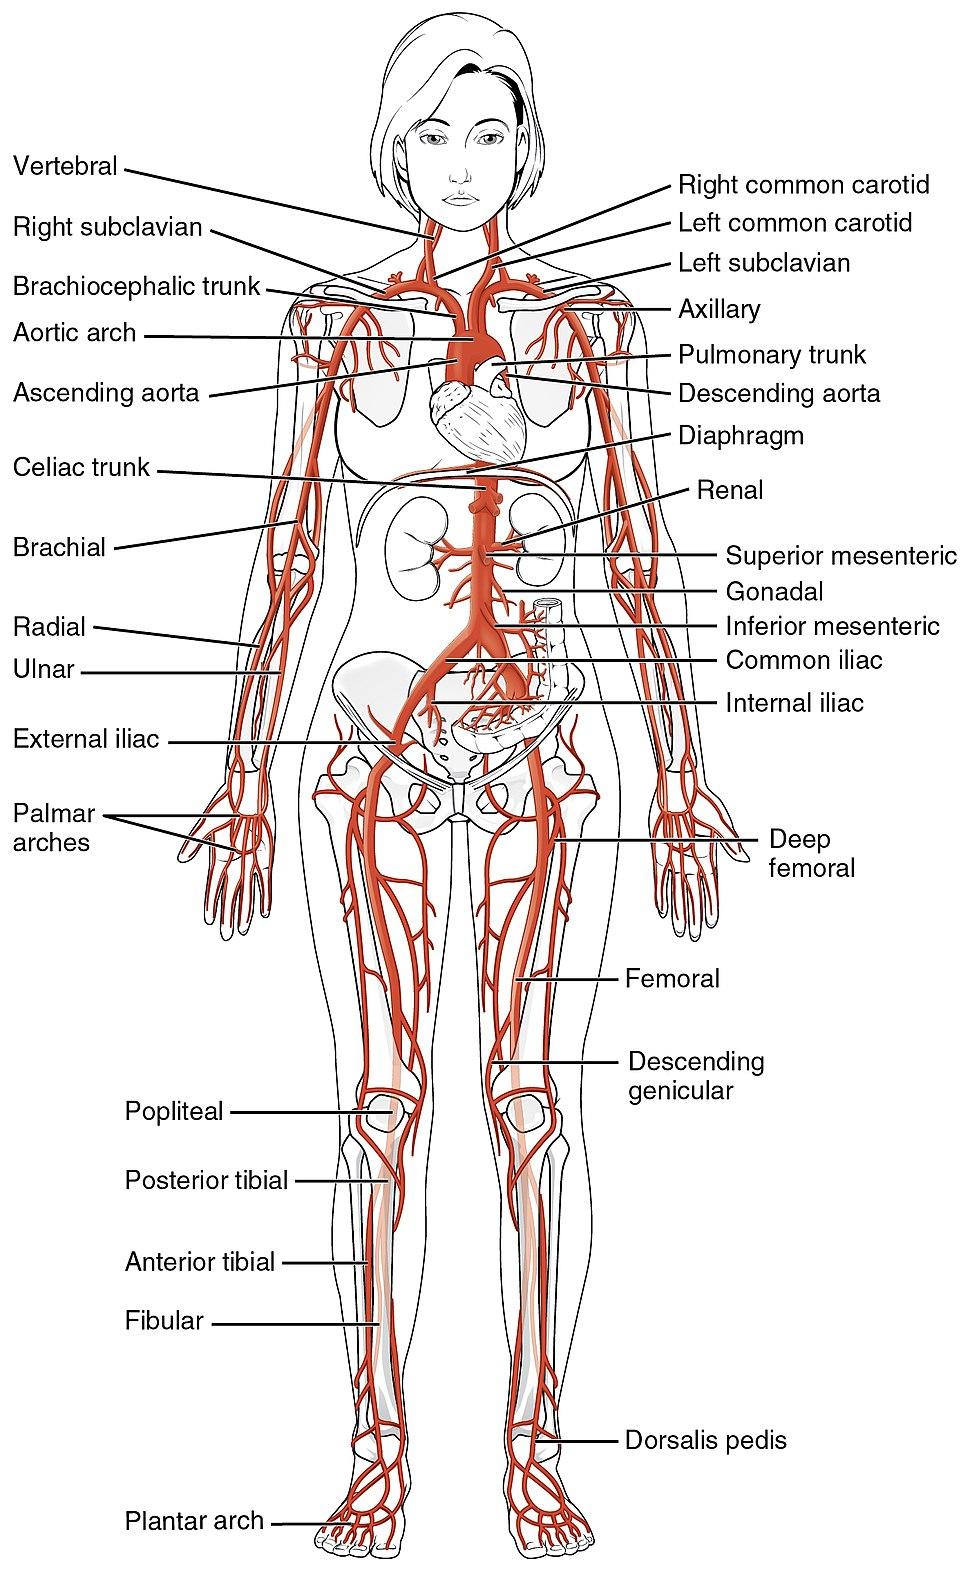 2120 Major Systemic Artery